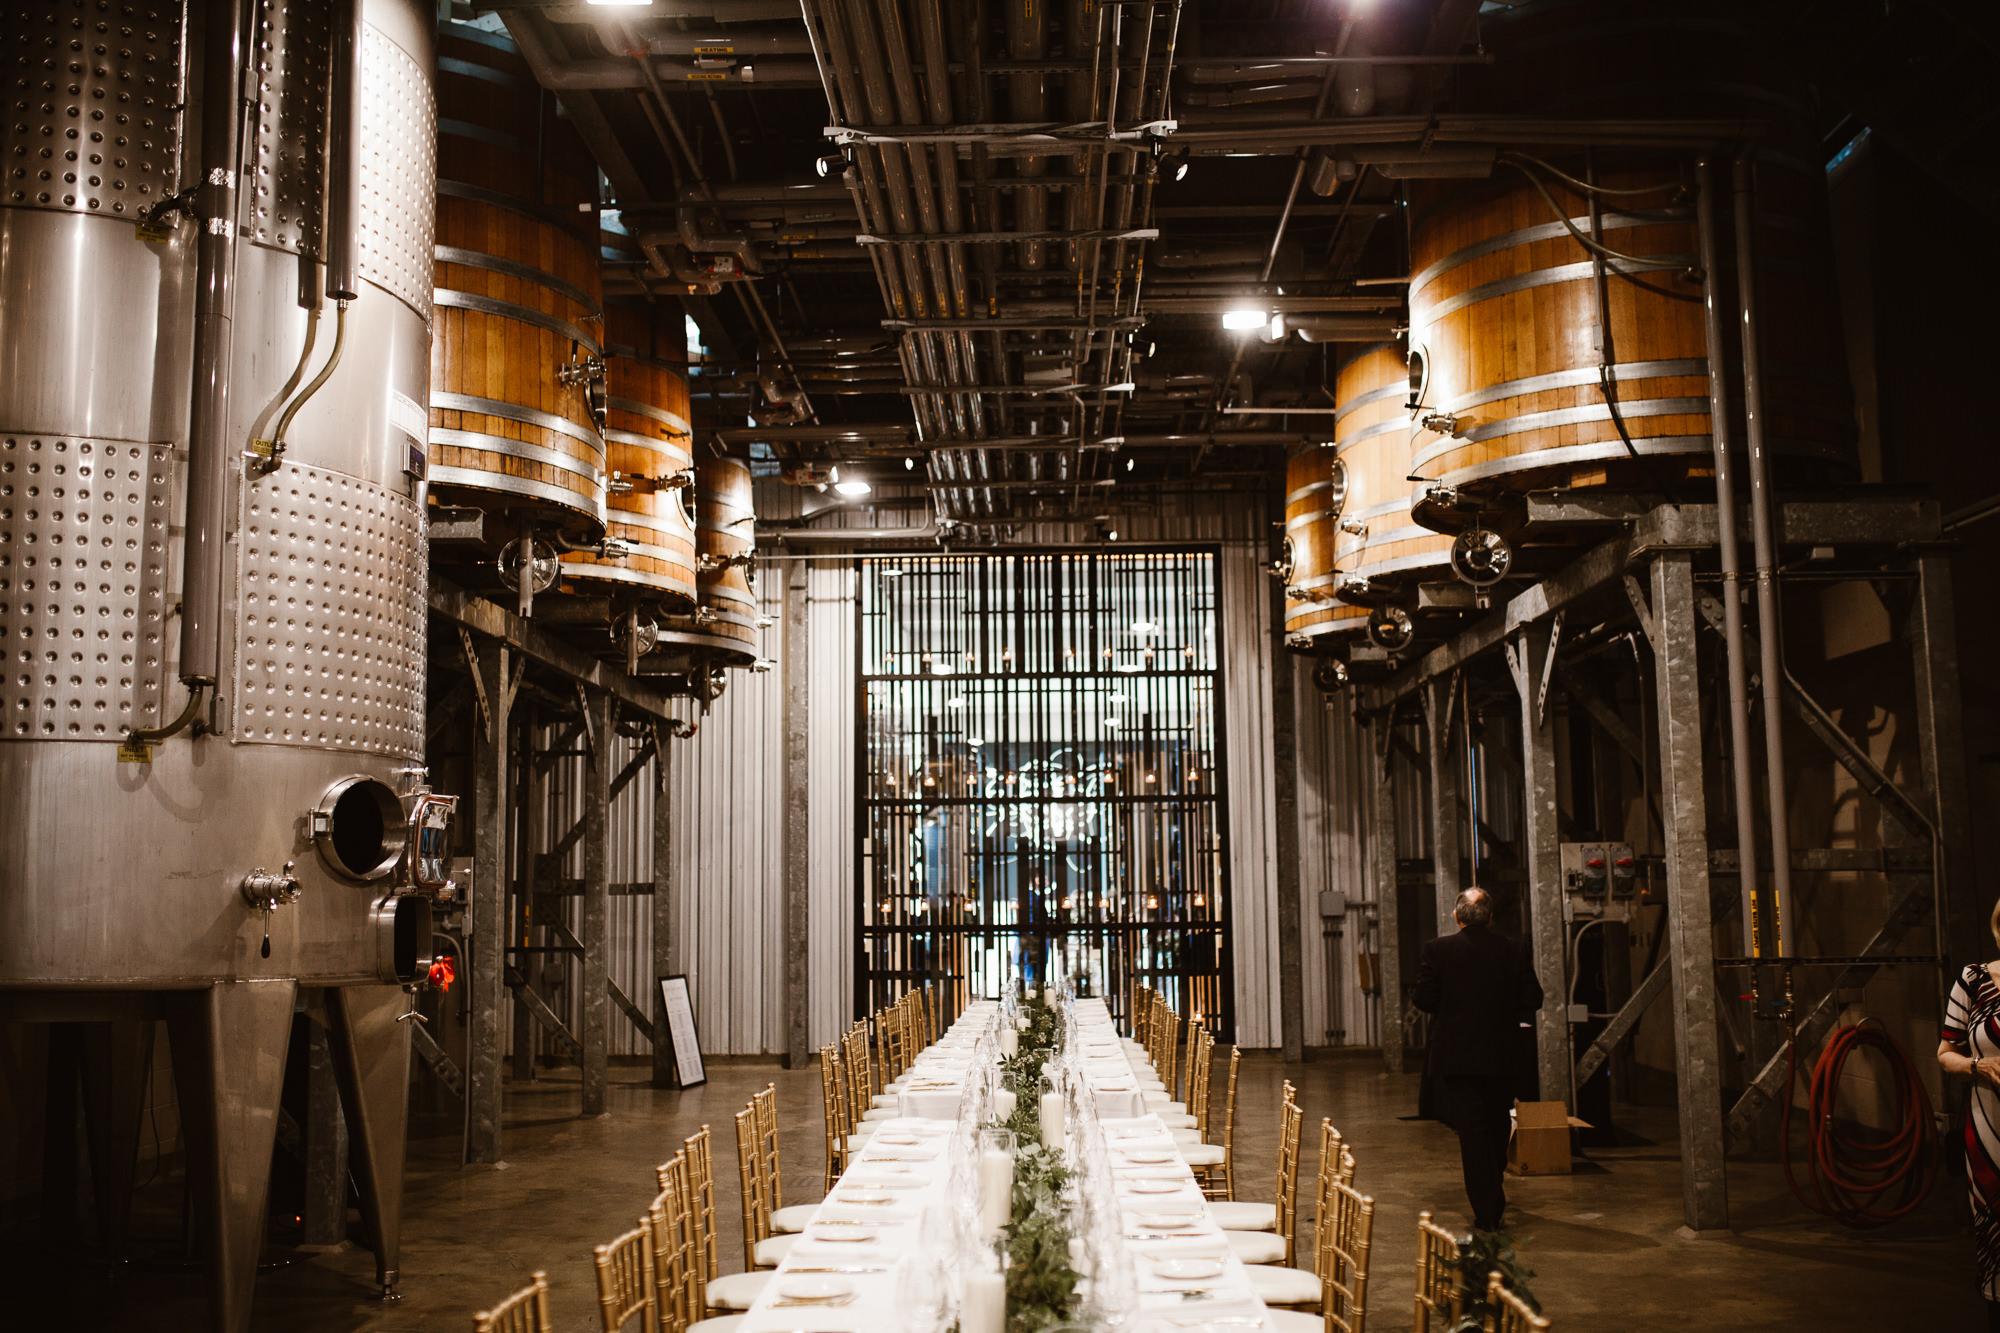 stratus-winery-wedding-vineyard-wedding-vineyard-bride-photo-by-reed-photography-045.jpg